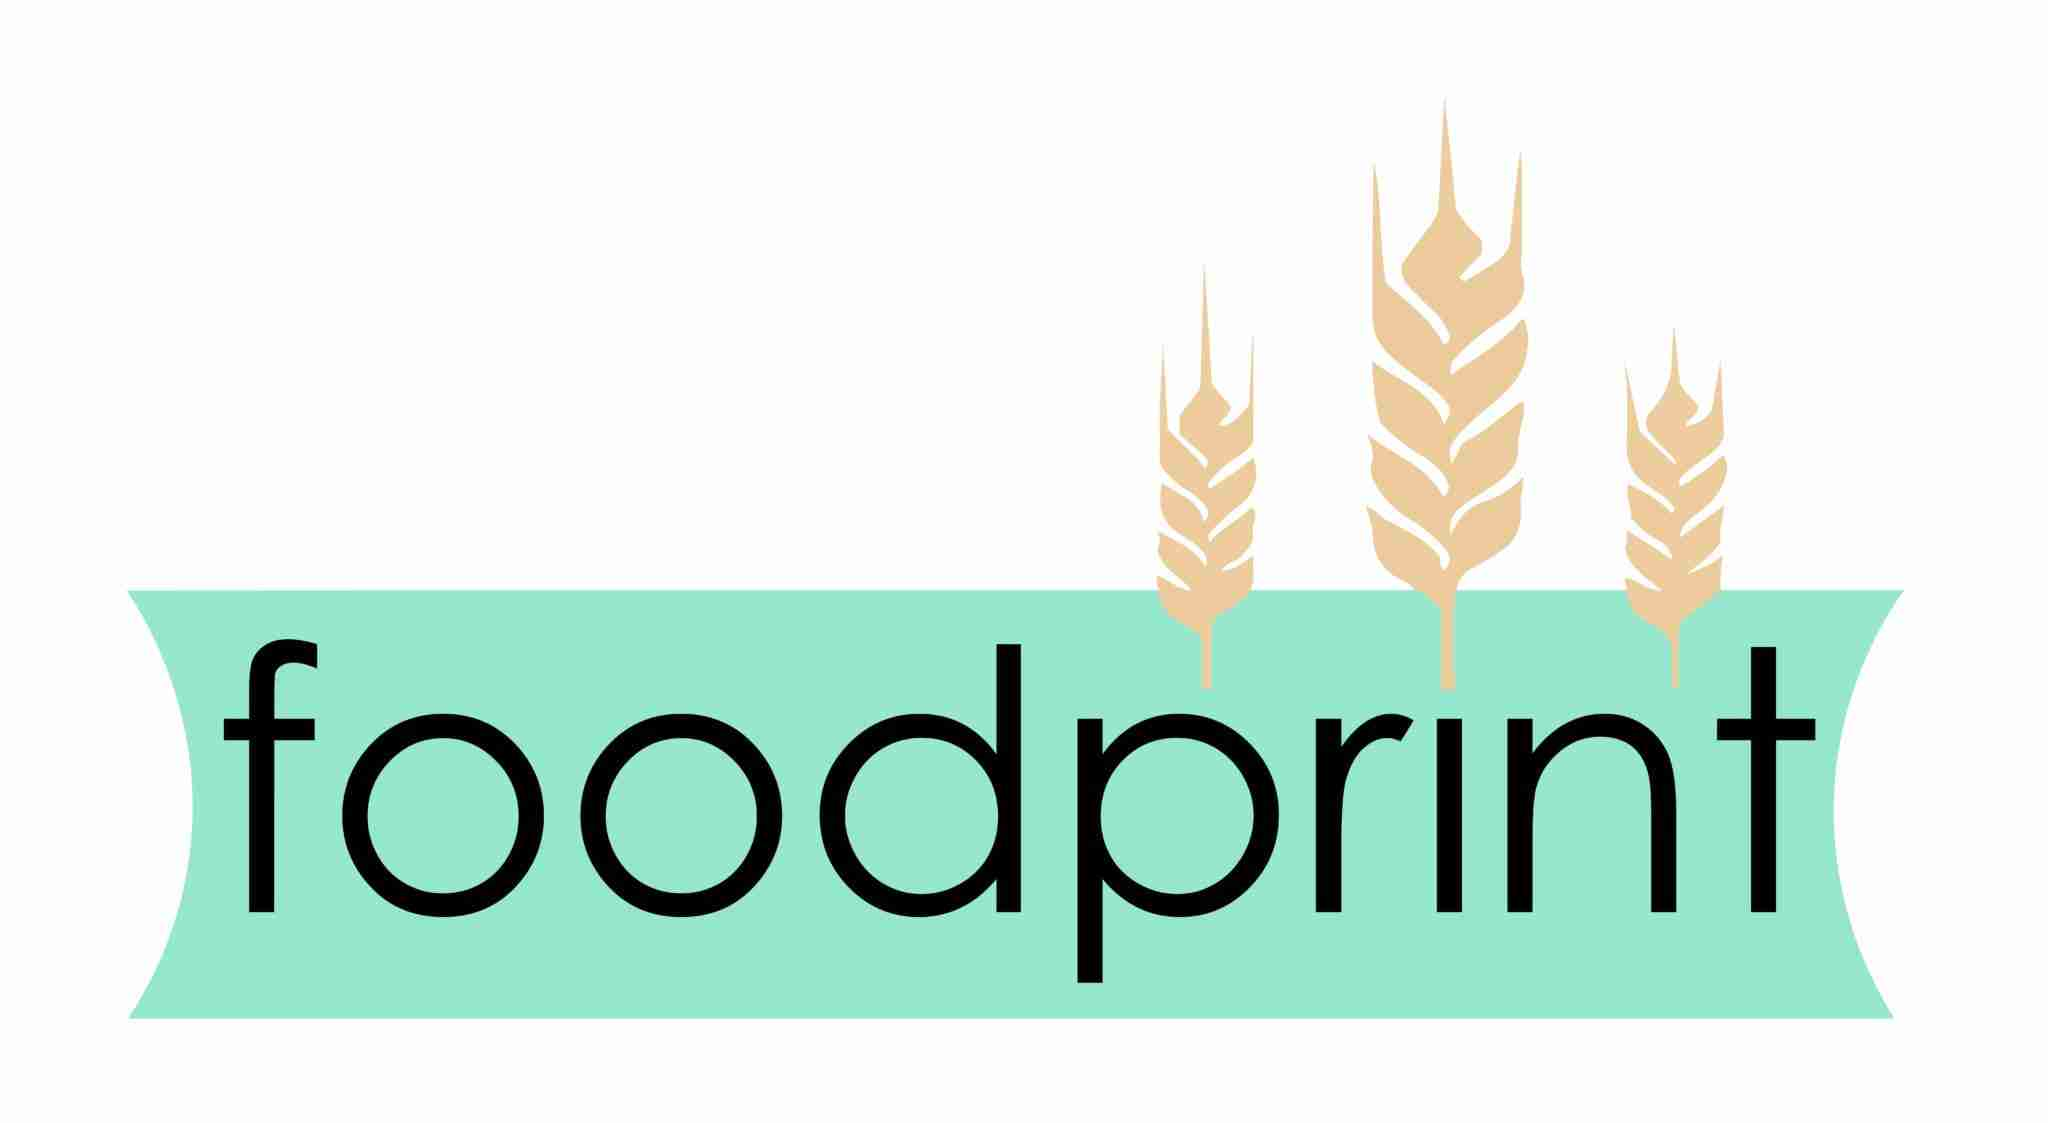 Foodprint